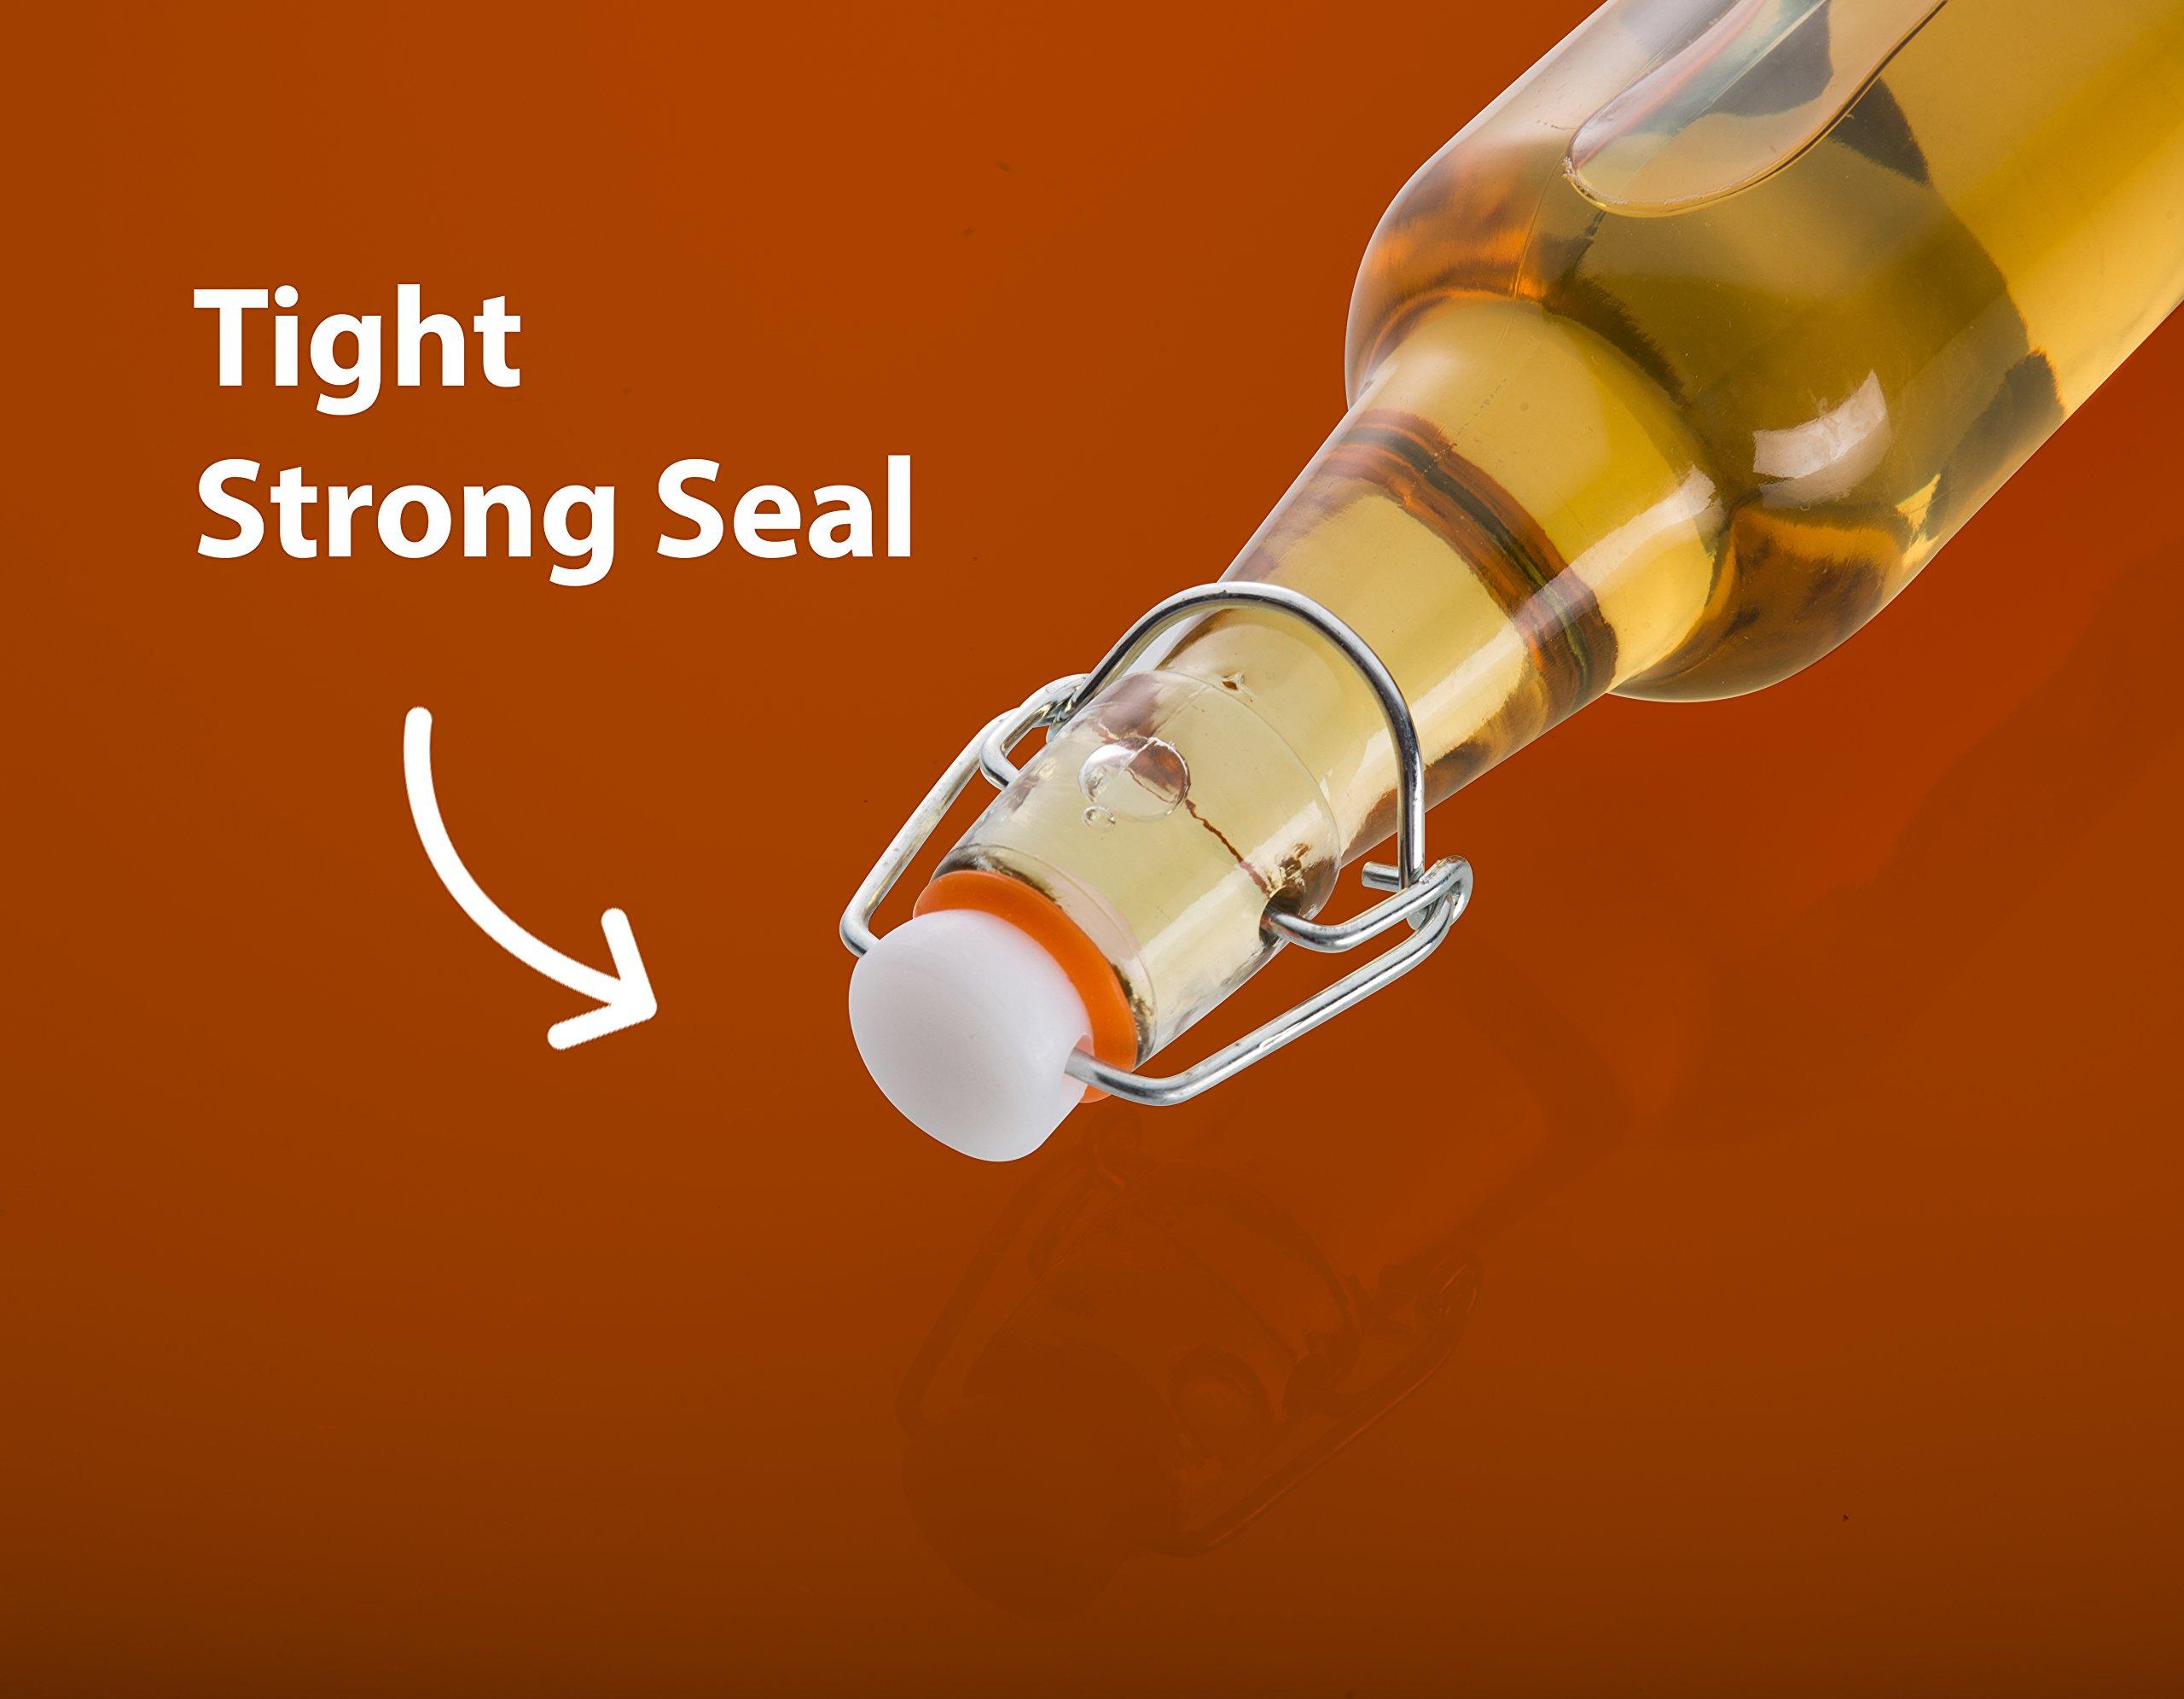 Zuzoro Glass Kombucha Bottles For Home Brewing Kombucha Kefir or Beer - 16 oz Clear Glass Grolsch Bottles case of 6 w/ Easy Swing top Cap w/ Gasket Seal Tight by Zuzuro (Image #3)